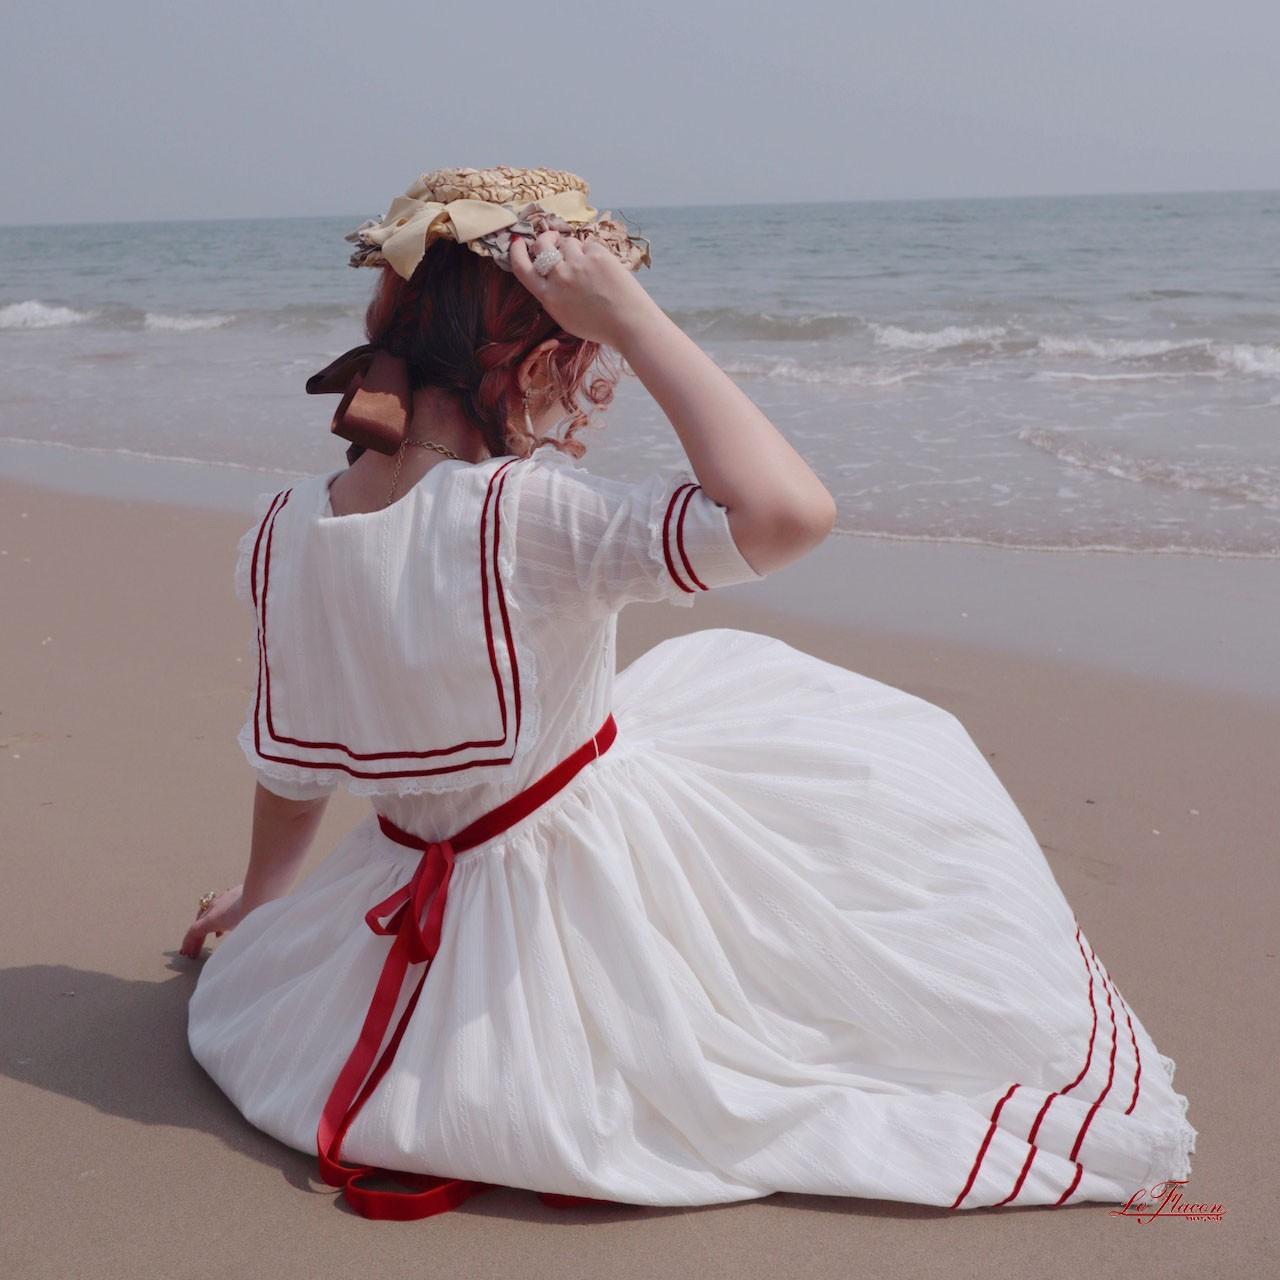 leFlacon SailorLullaby*法式复古少女条纹刺绣红线水手连衣裙